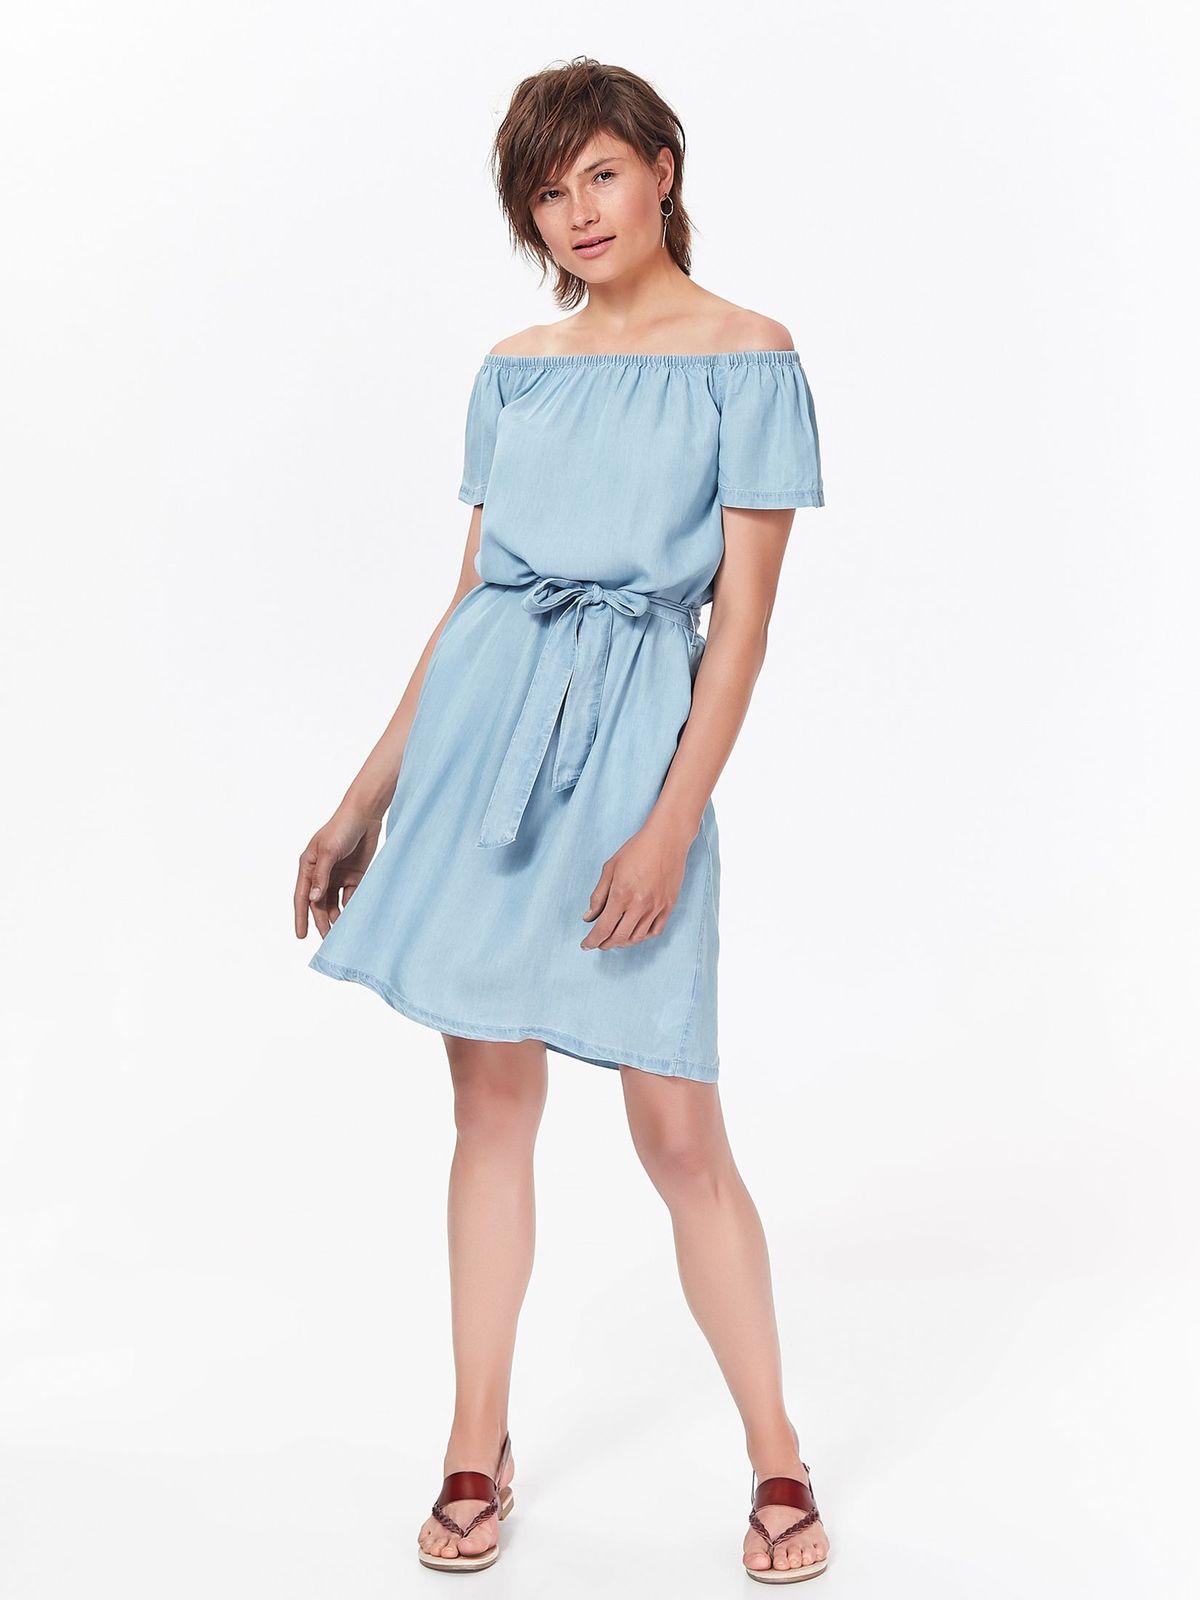 afd4655886b6 TOP SECRET TOP SECRET φορεμα soft denim